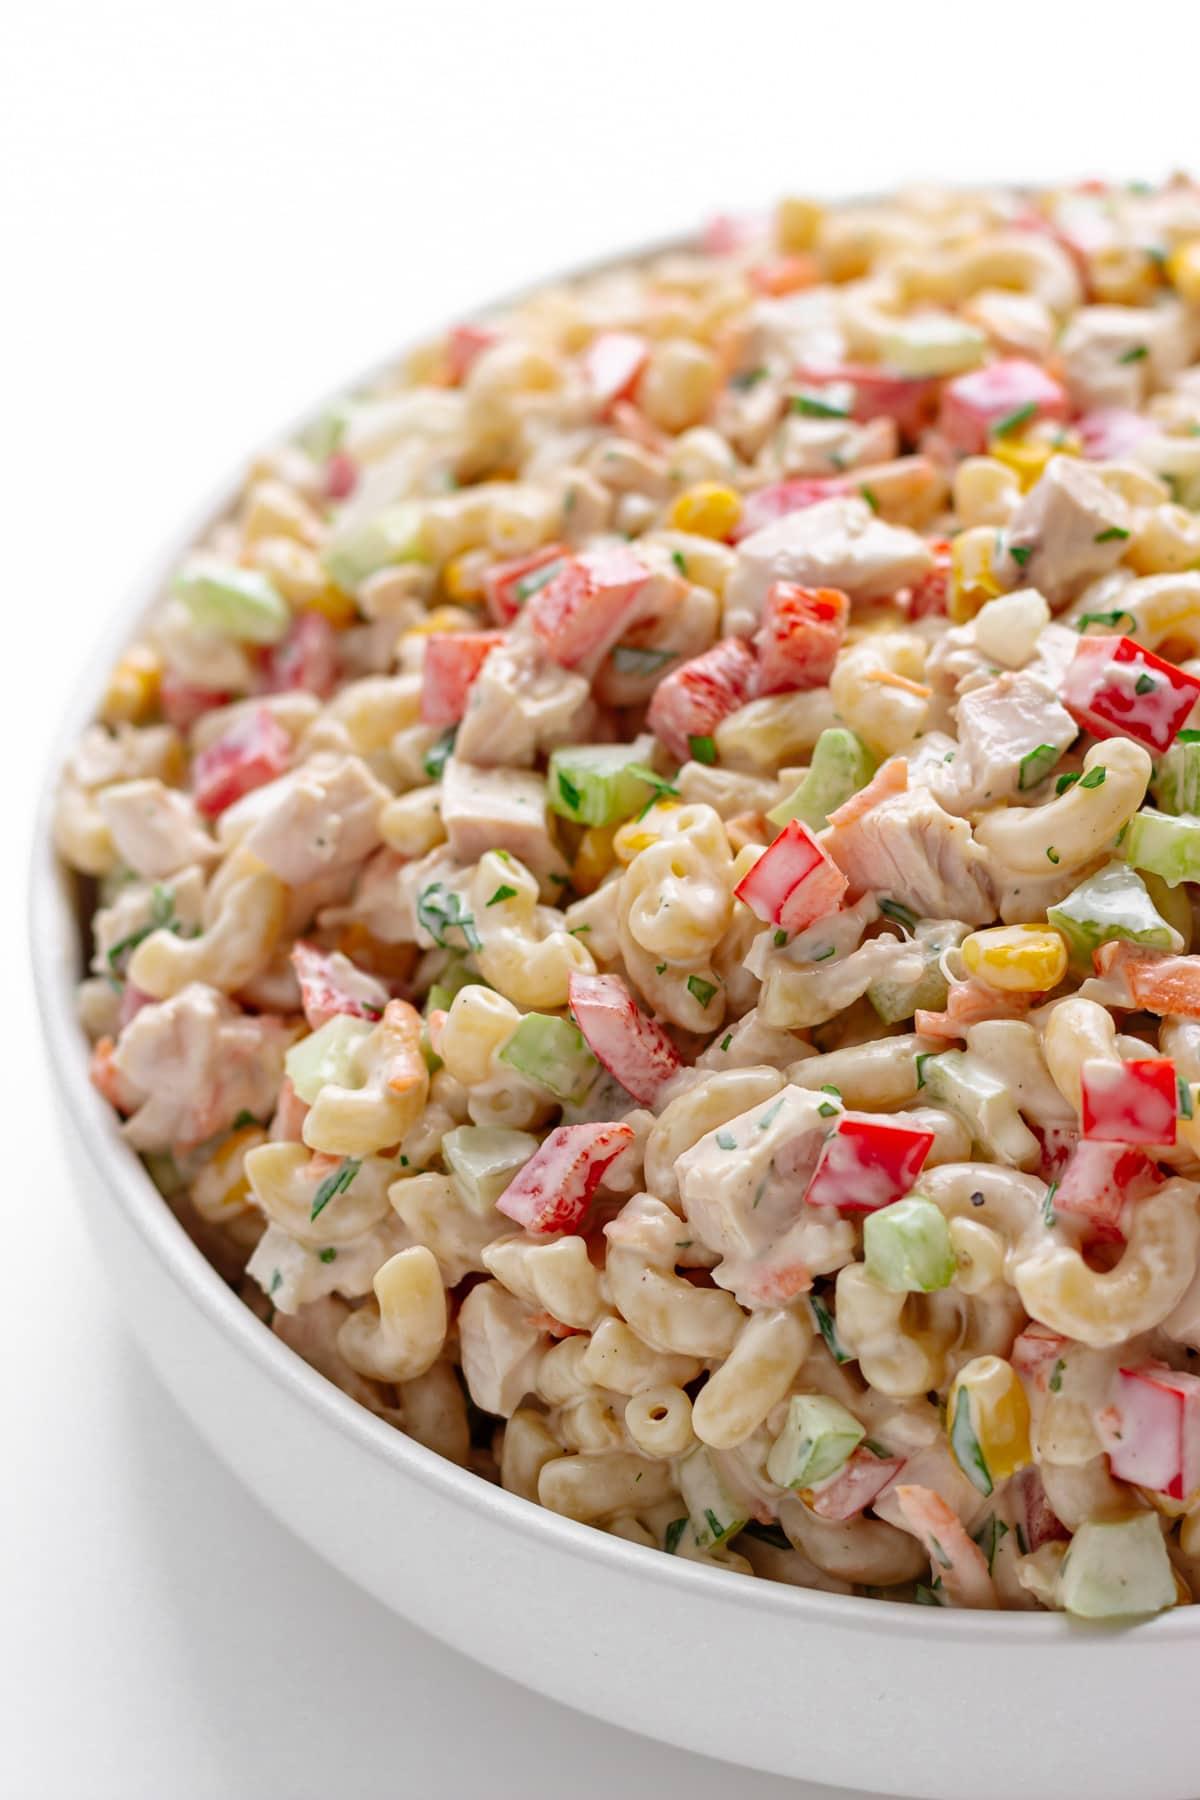 White serving bowl filled with macaroni salad.